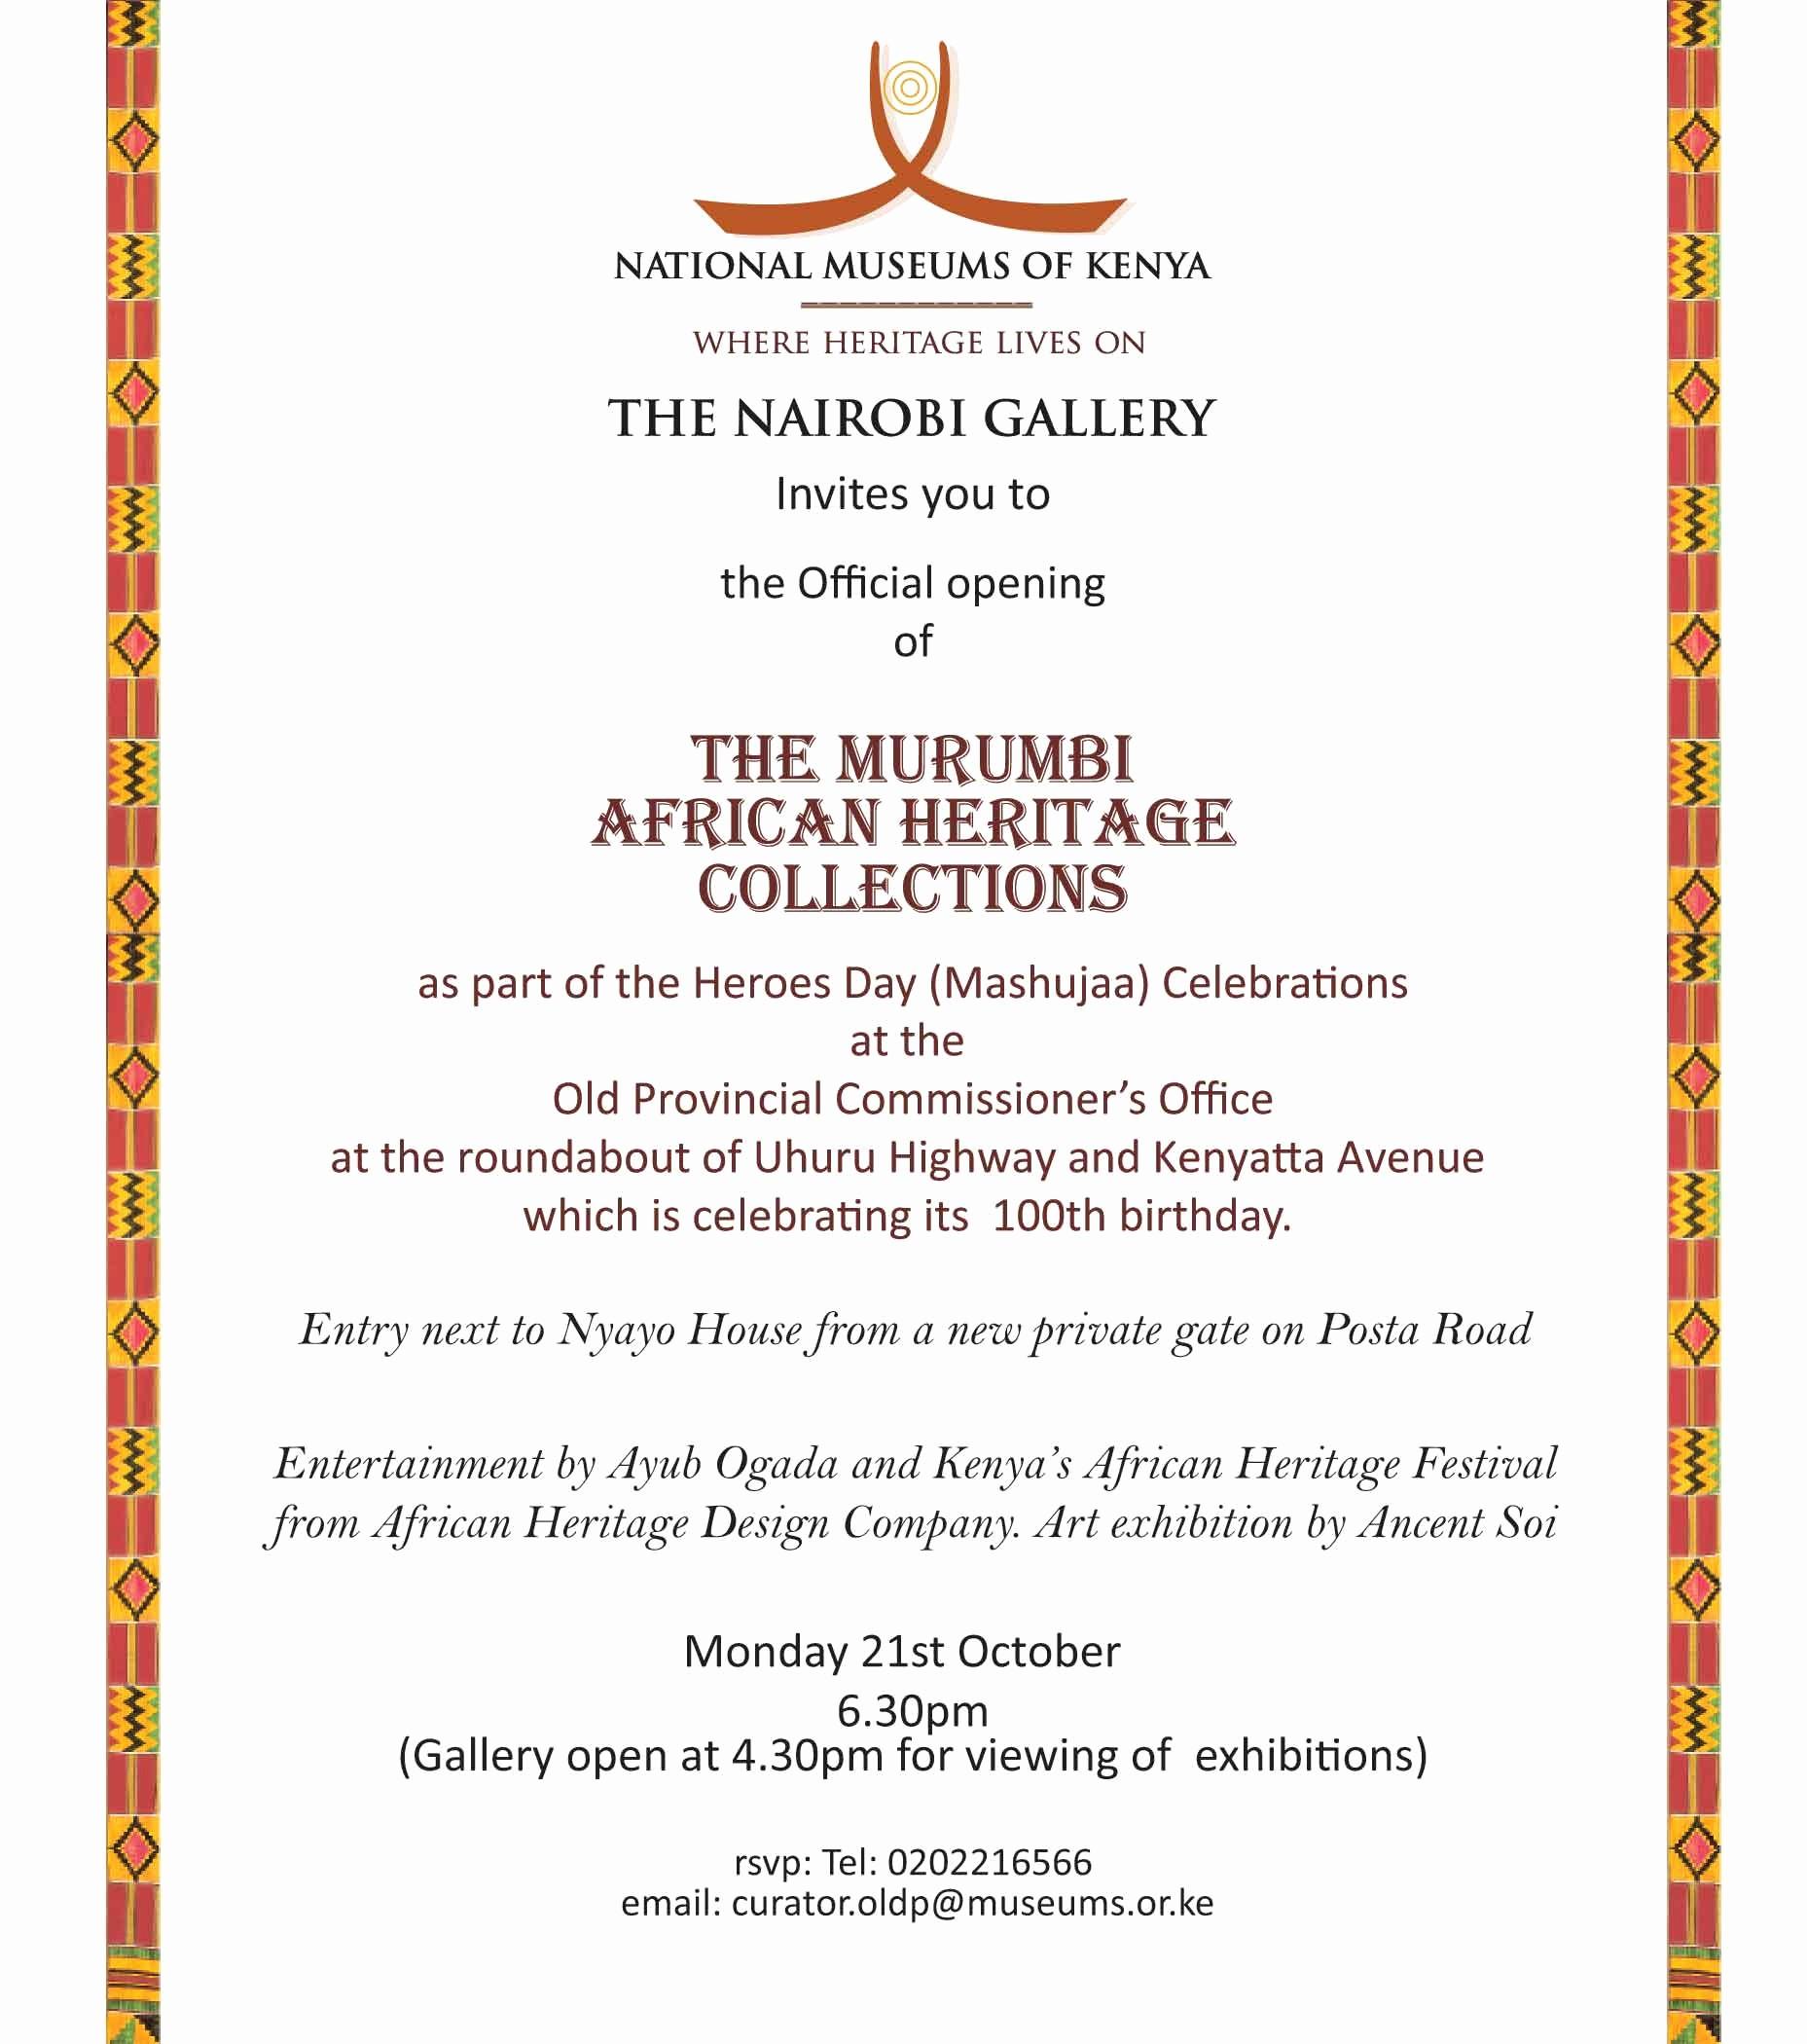 Office Open House Invitation Wording Luxury Opening the Murumbi African Heritage Collections Oct 21